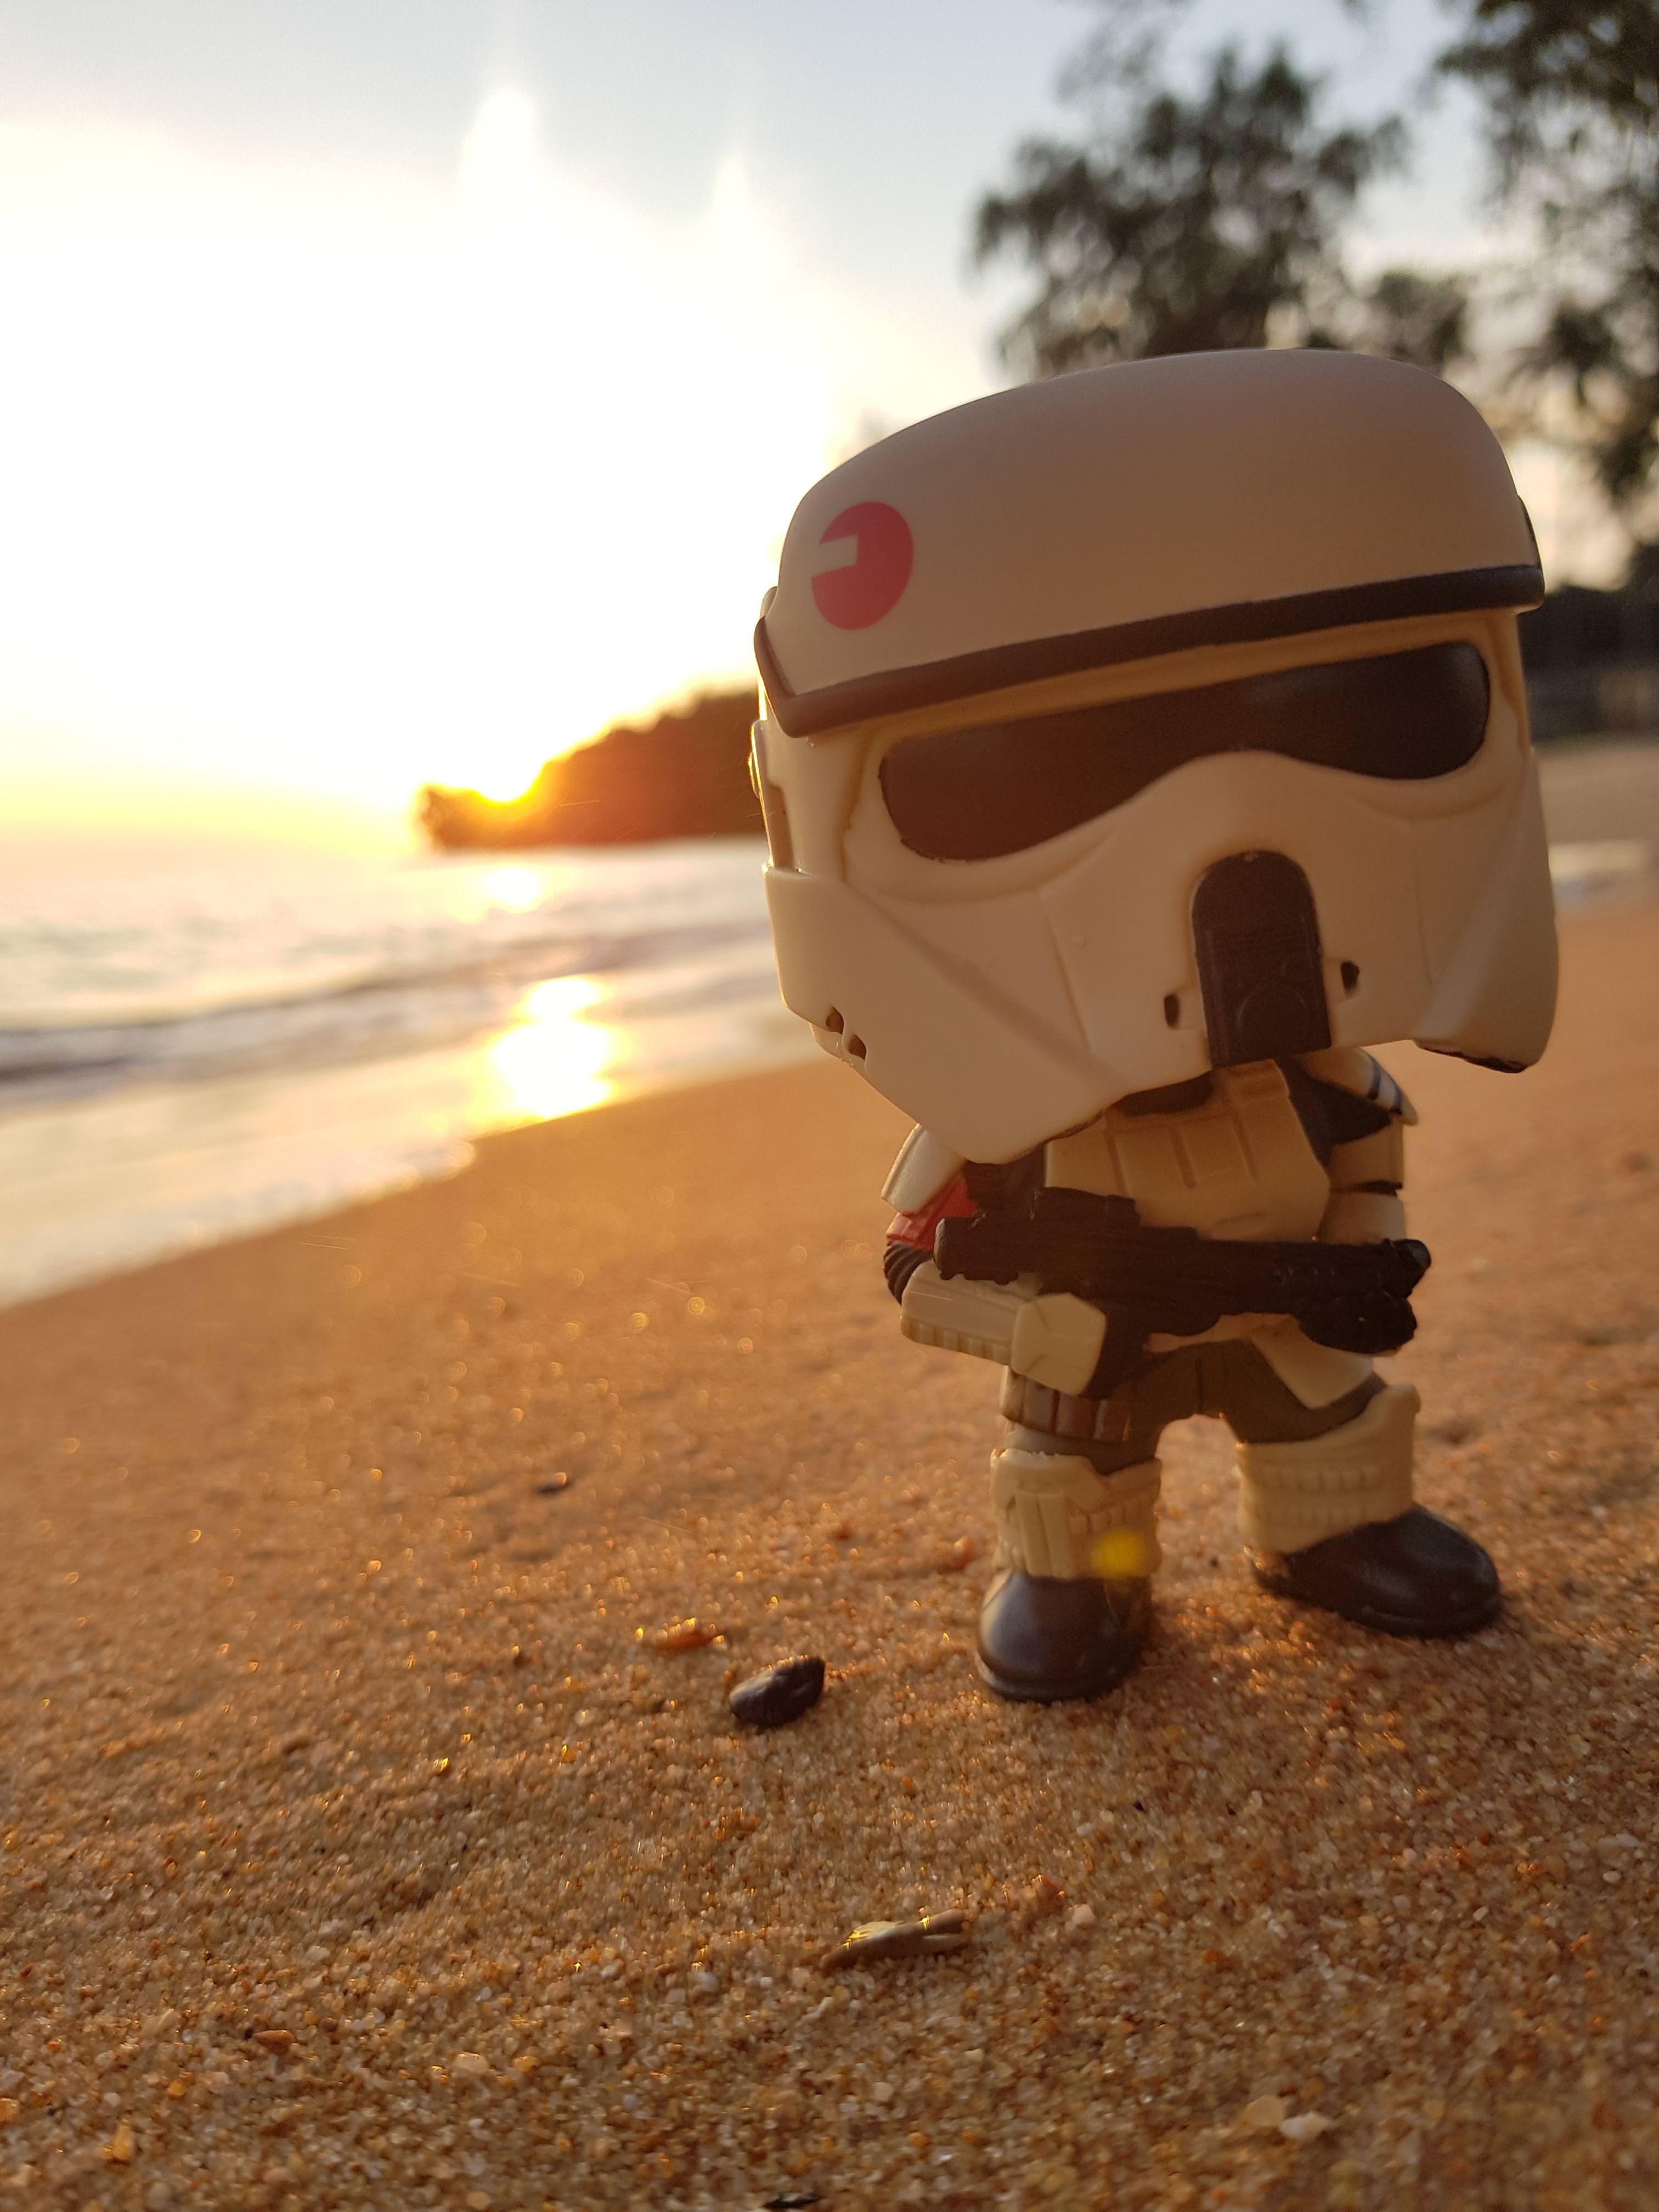 Shoretrooper on patrol